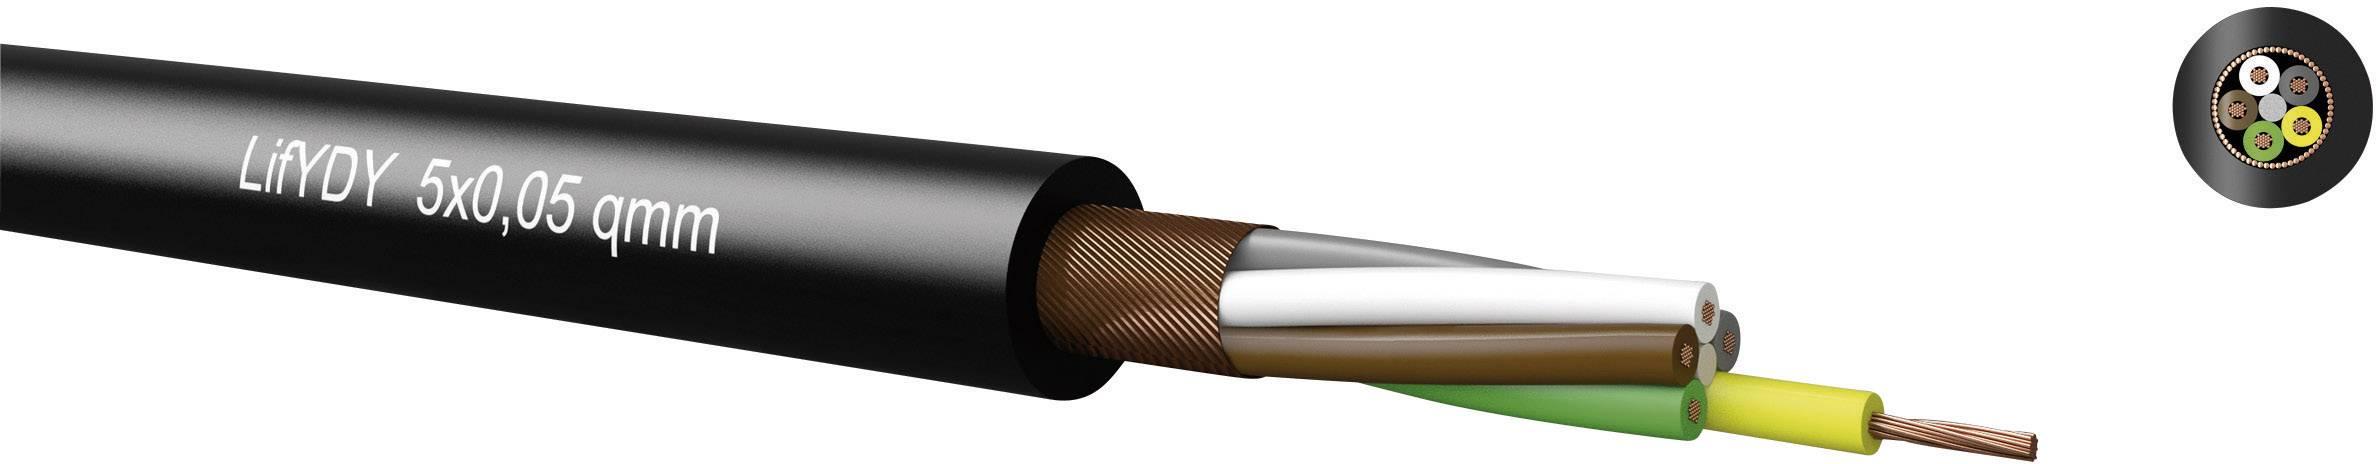 Riadiaci kábel Kabeltronik LifYDY 340201000, 2 x 0.10 mm², vonkajší Ø 3.60 mm, 300 V, metrový tovar, čierna